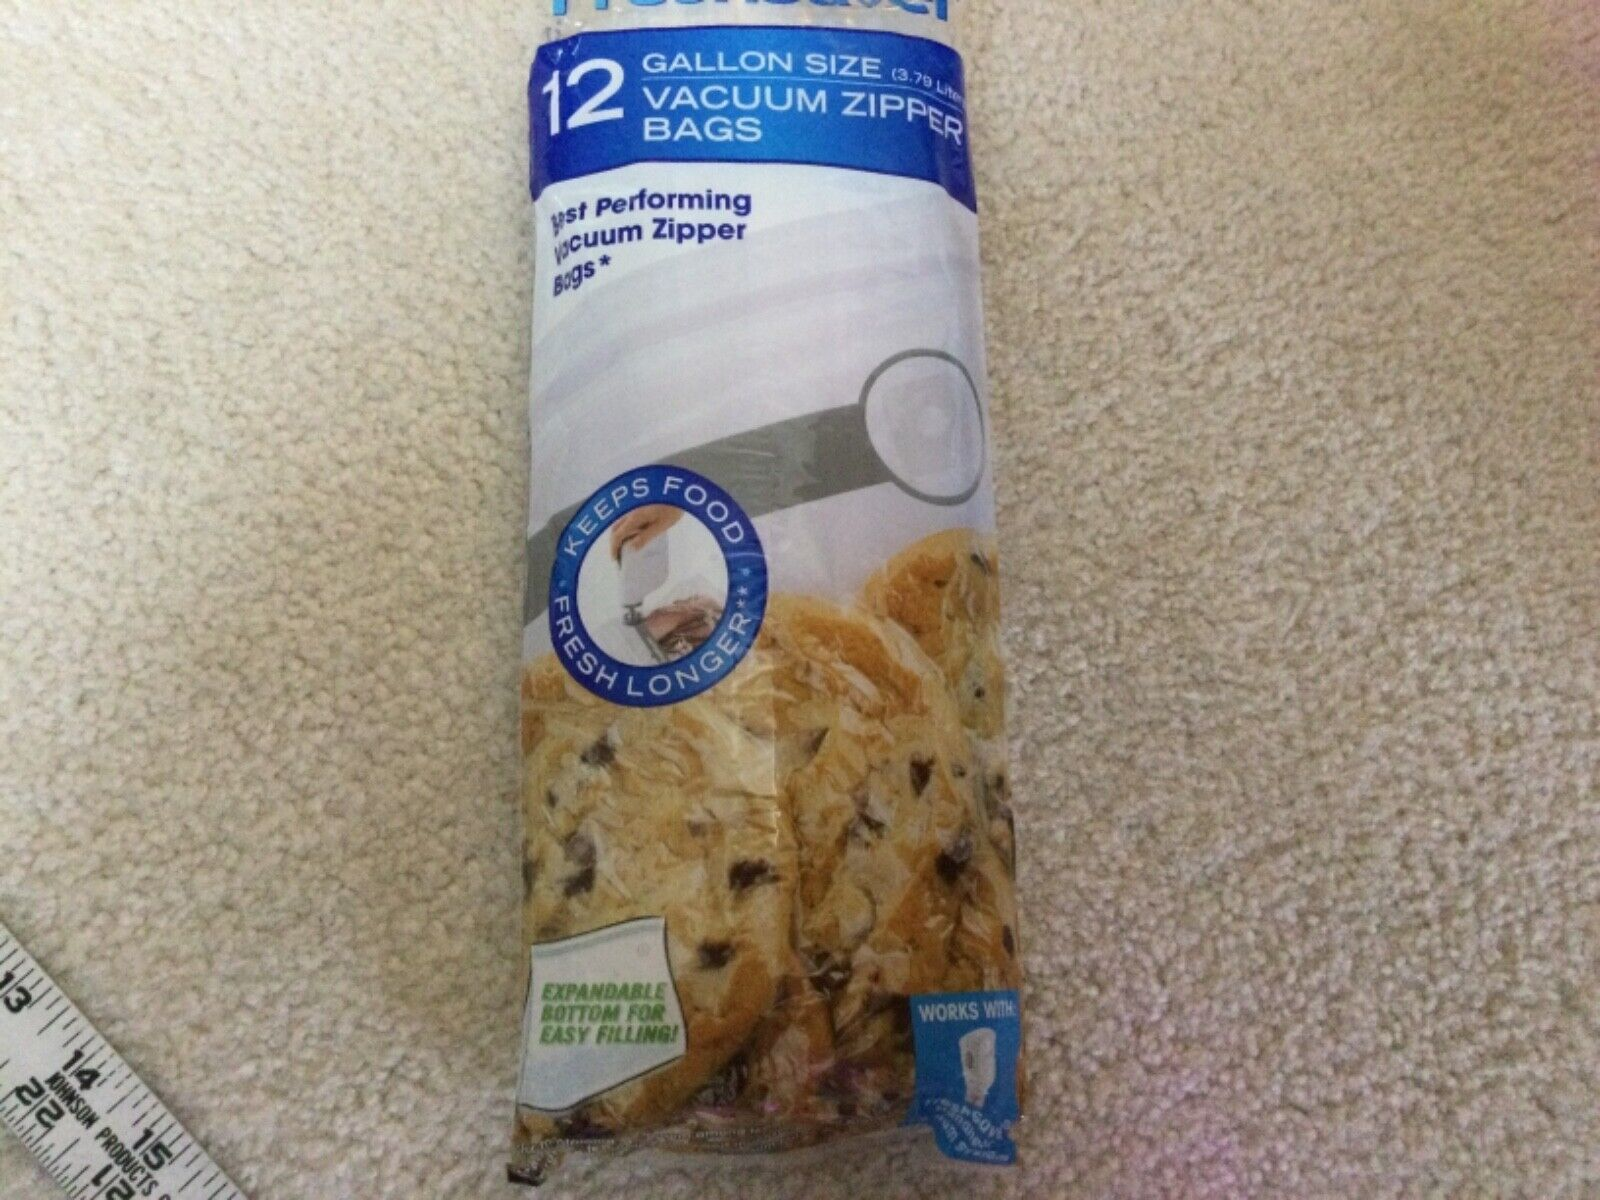 Foodsaver Freshsaver Gallon Size Vacuum Zipper Bags Expandable 12 Sealed Bag - $12.99